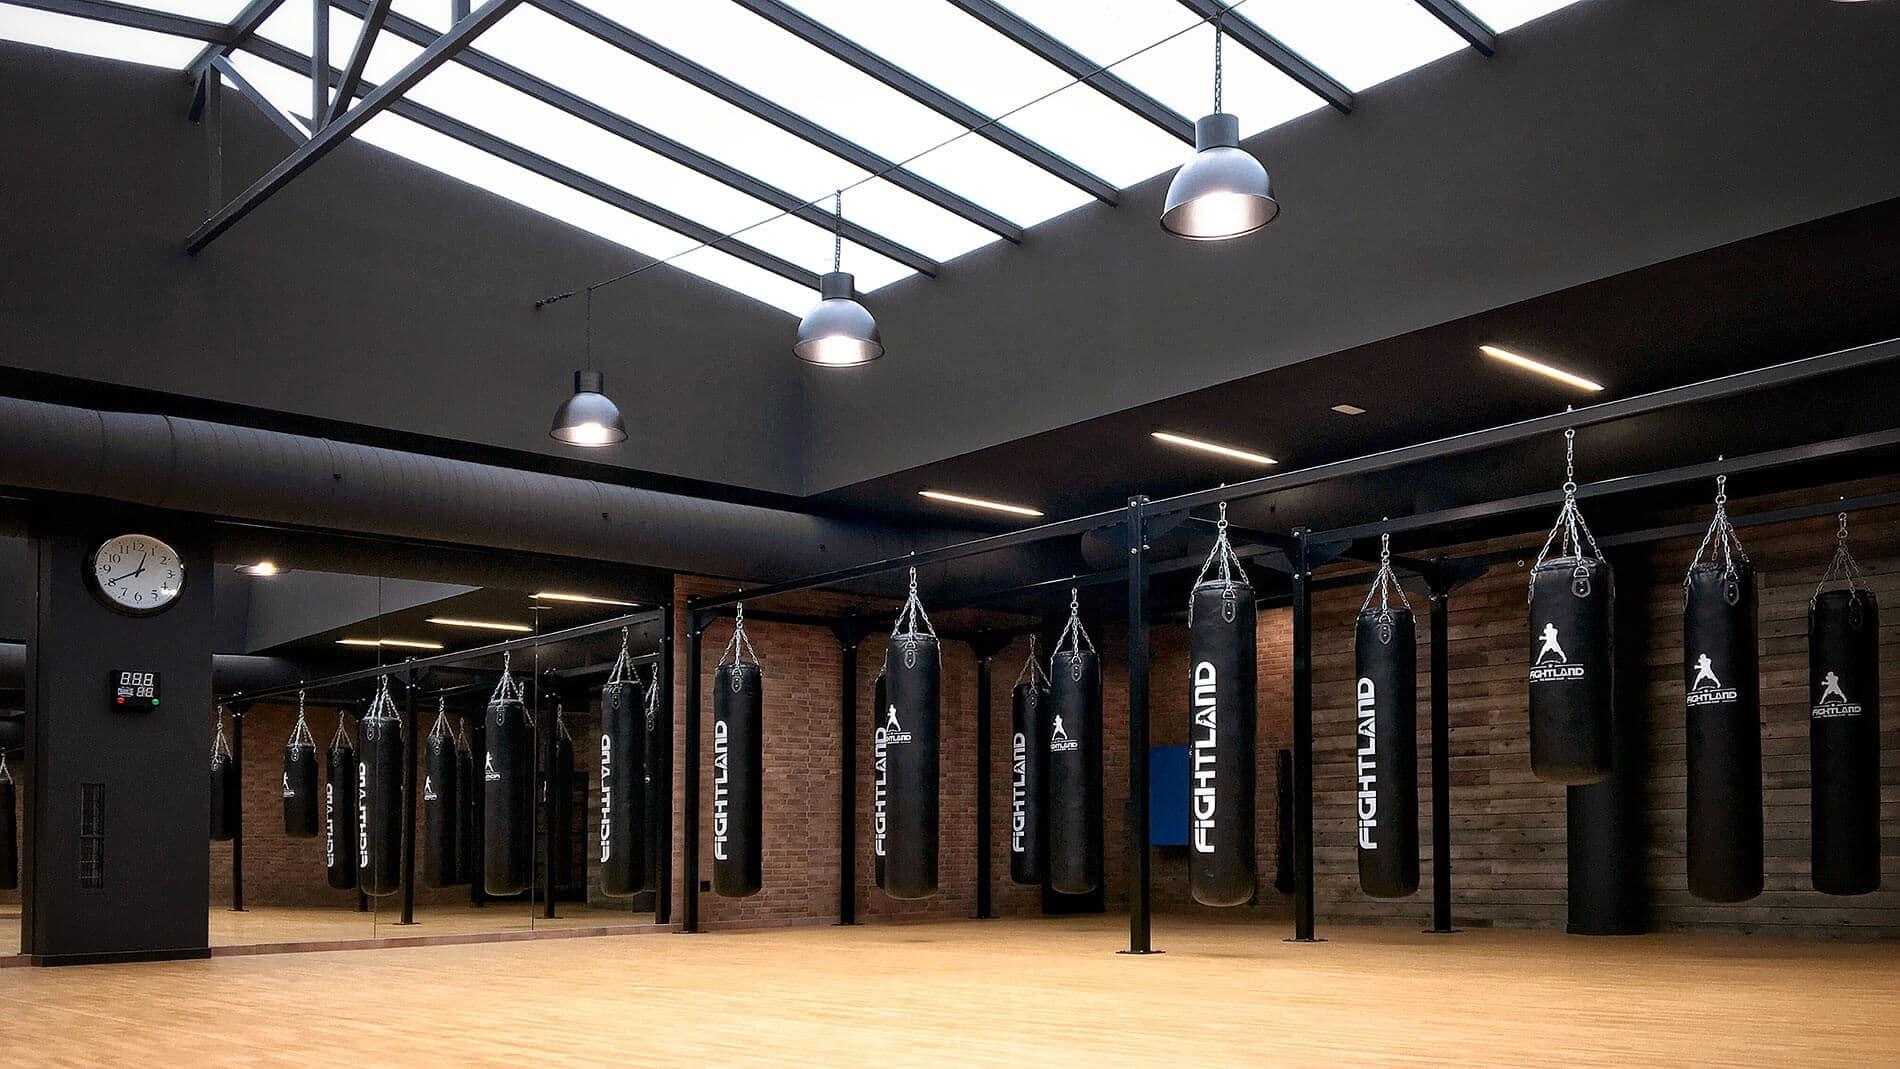 Fightland - Club Boxeo -  A Coruña